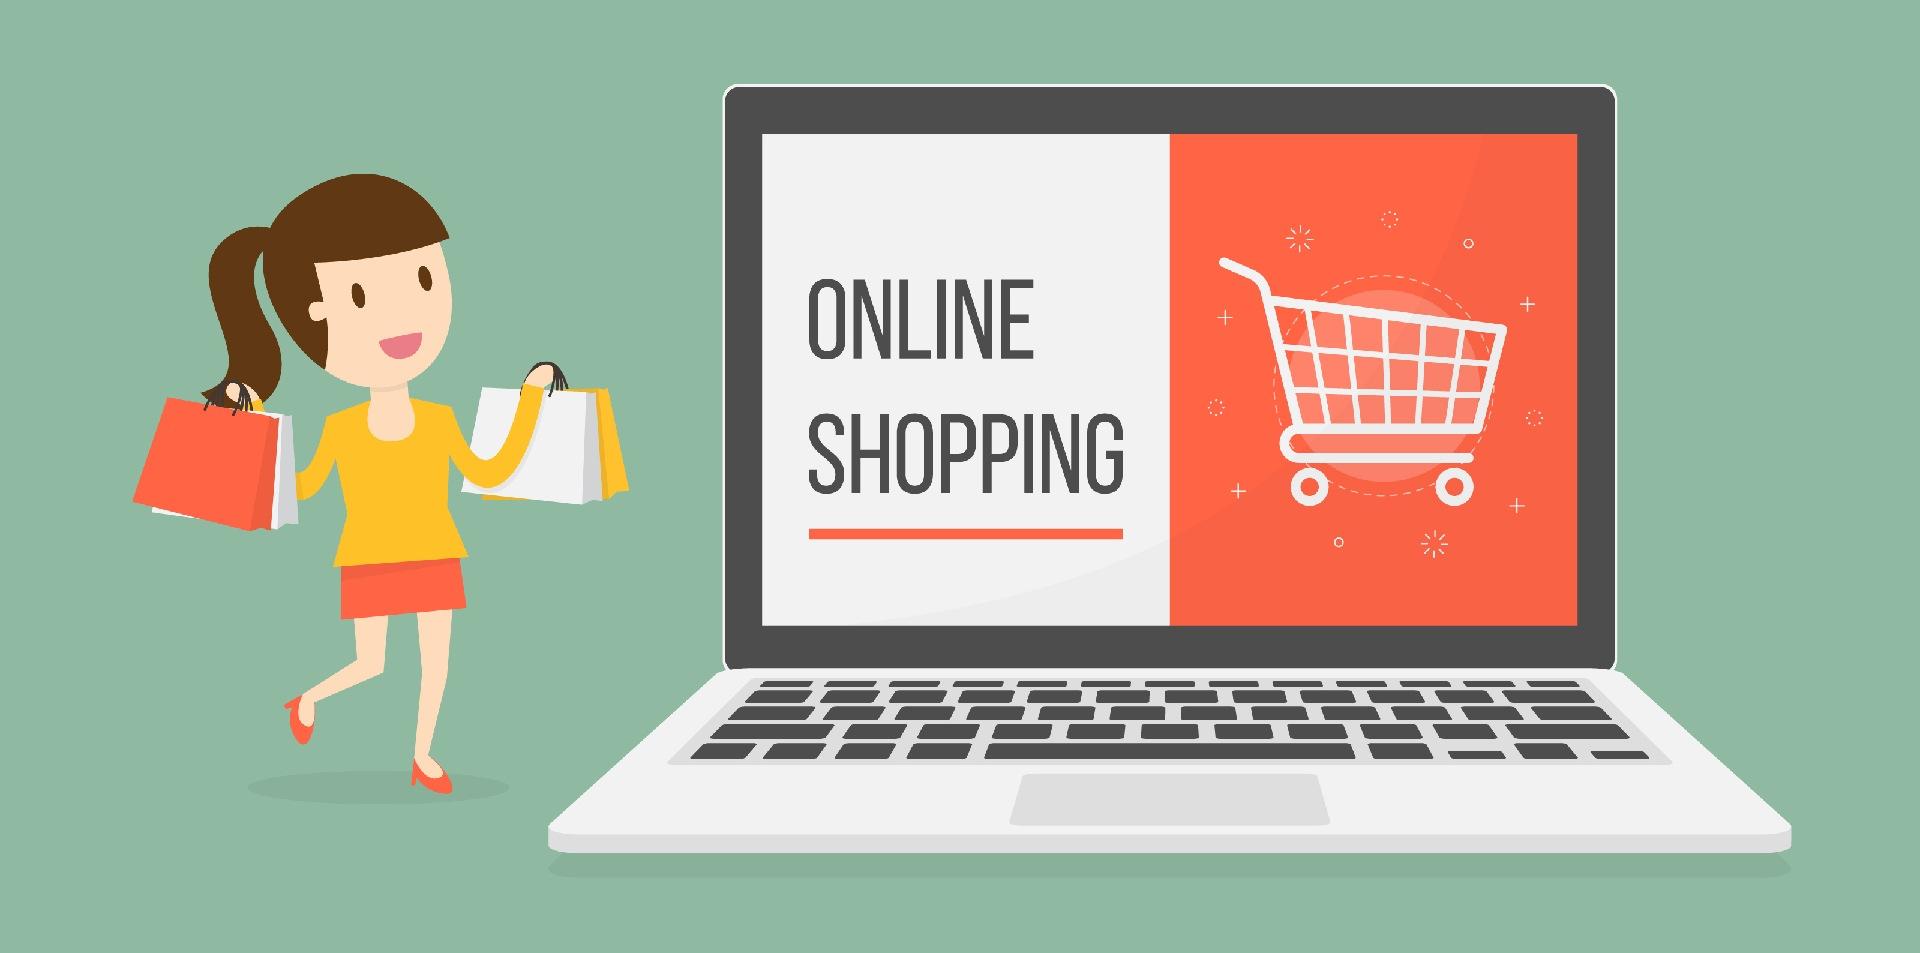 14 Ways for Safe & secure Online Shopping